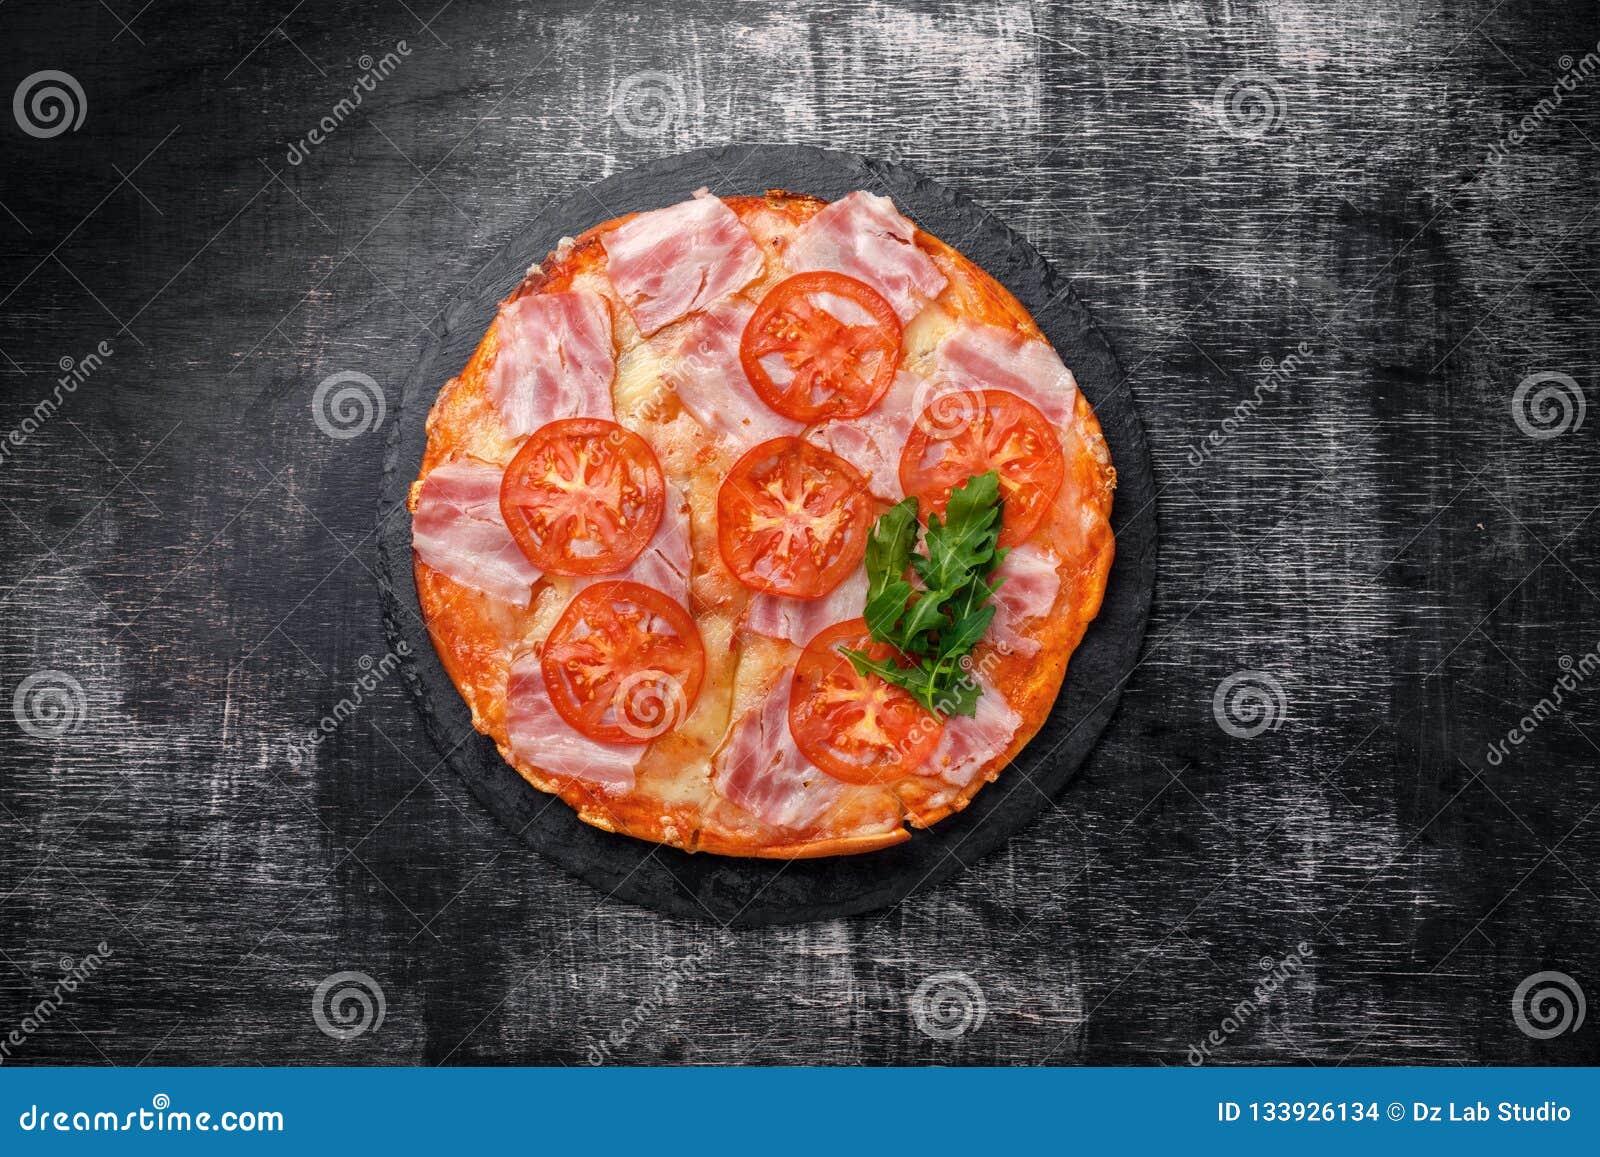 Traditional italian pizza with mozzarella cheese, ham, tomatoes